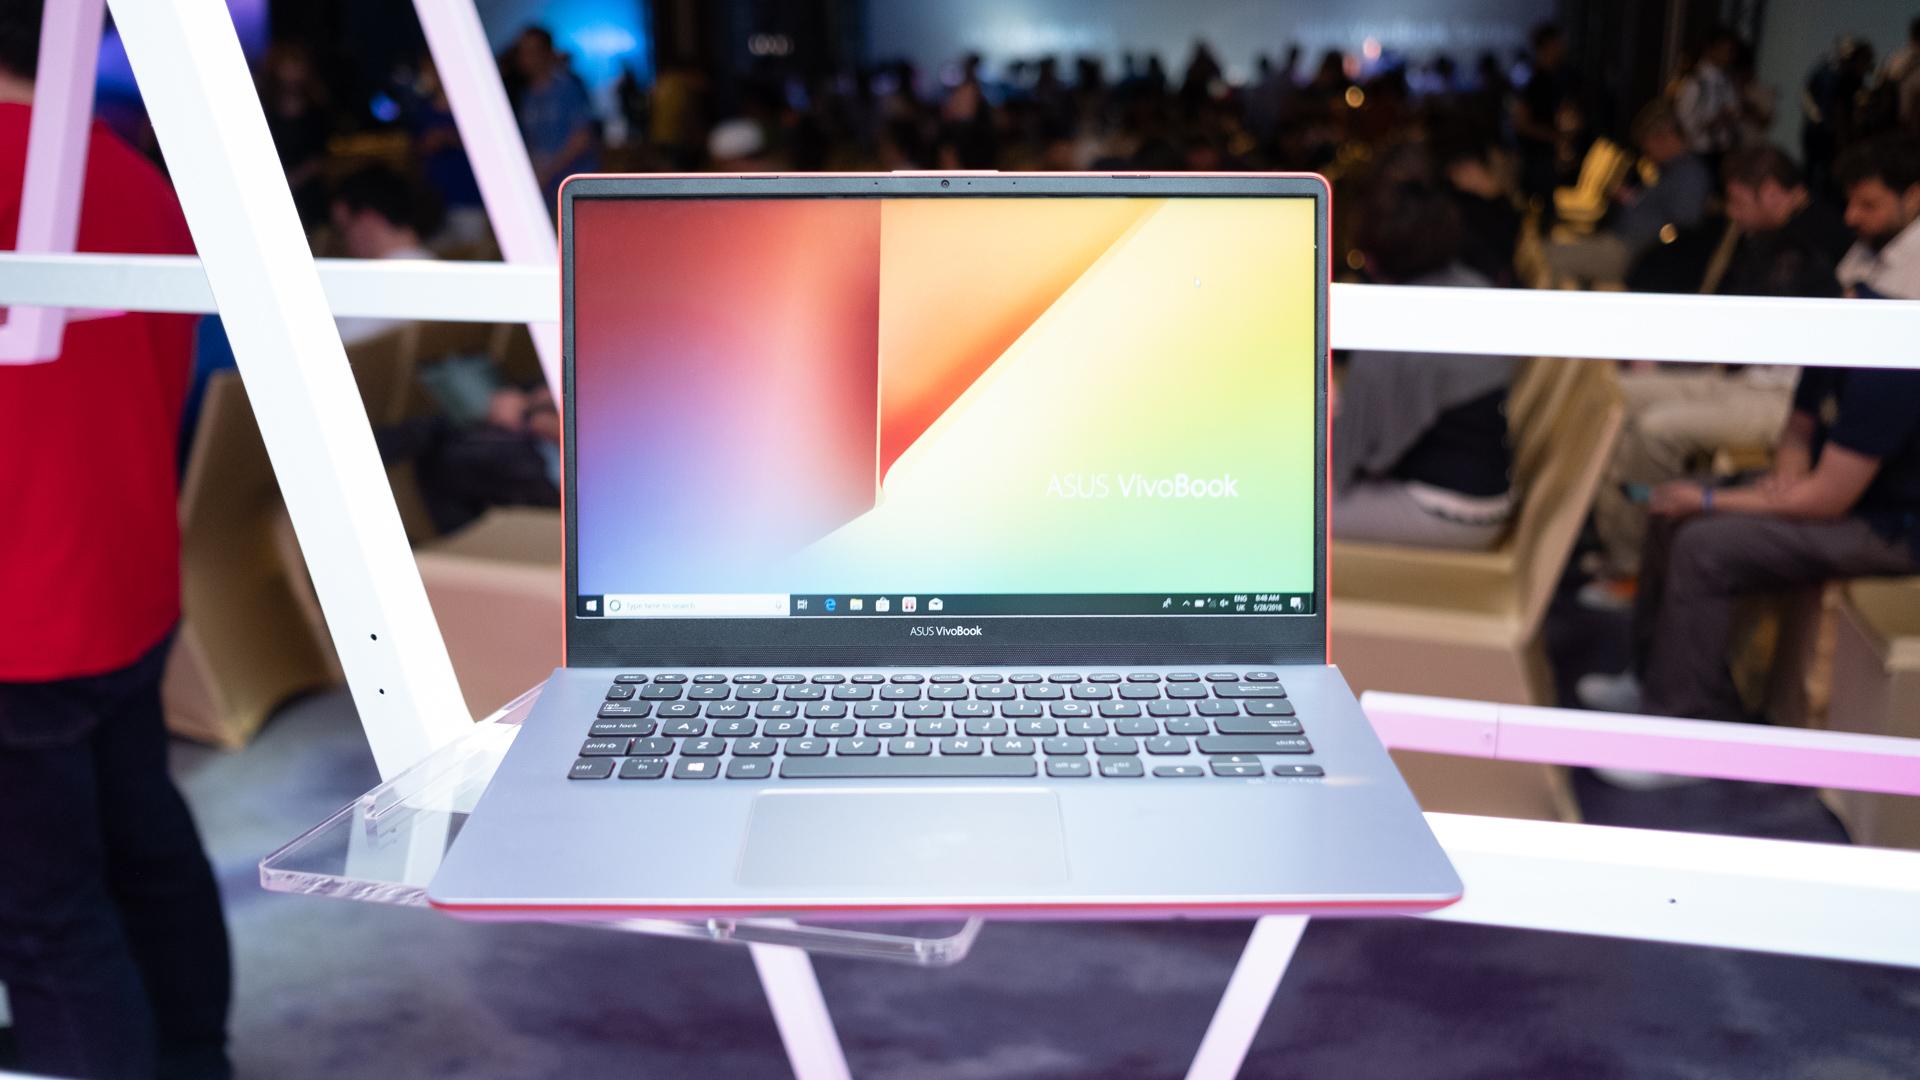 Hands on: Asus VivoBook S review | TechRadar